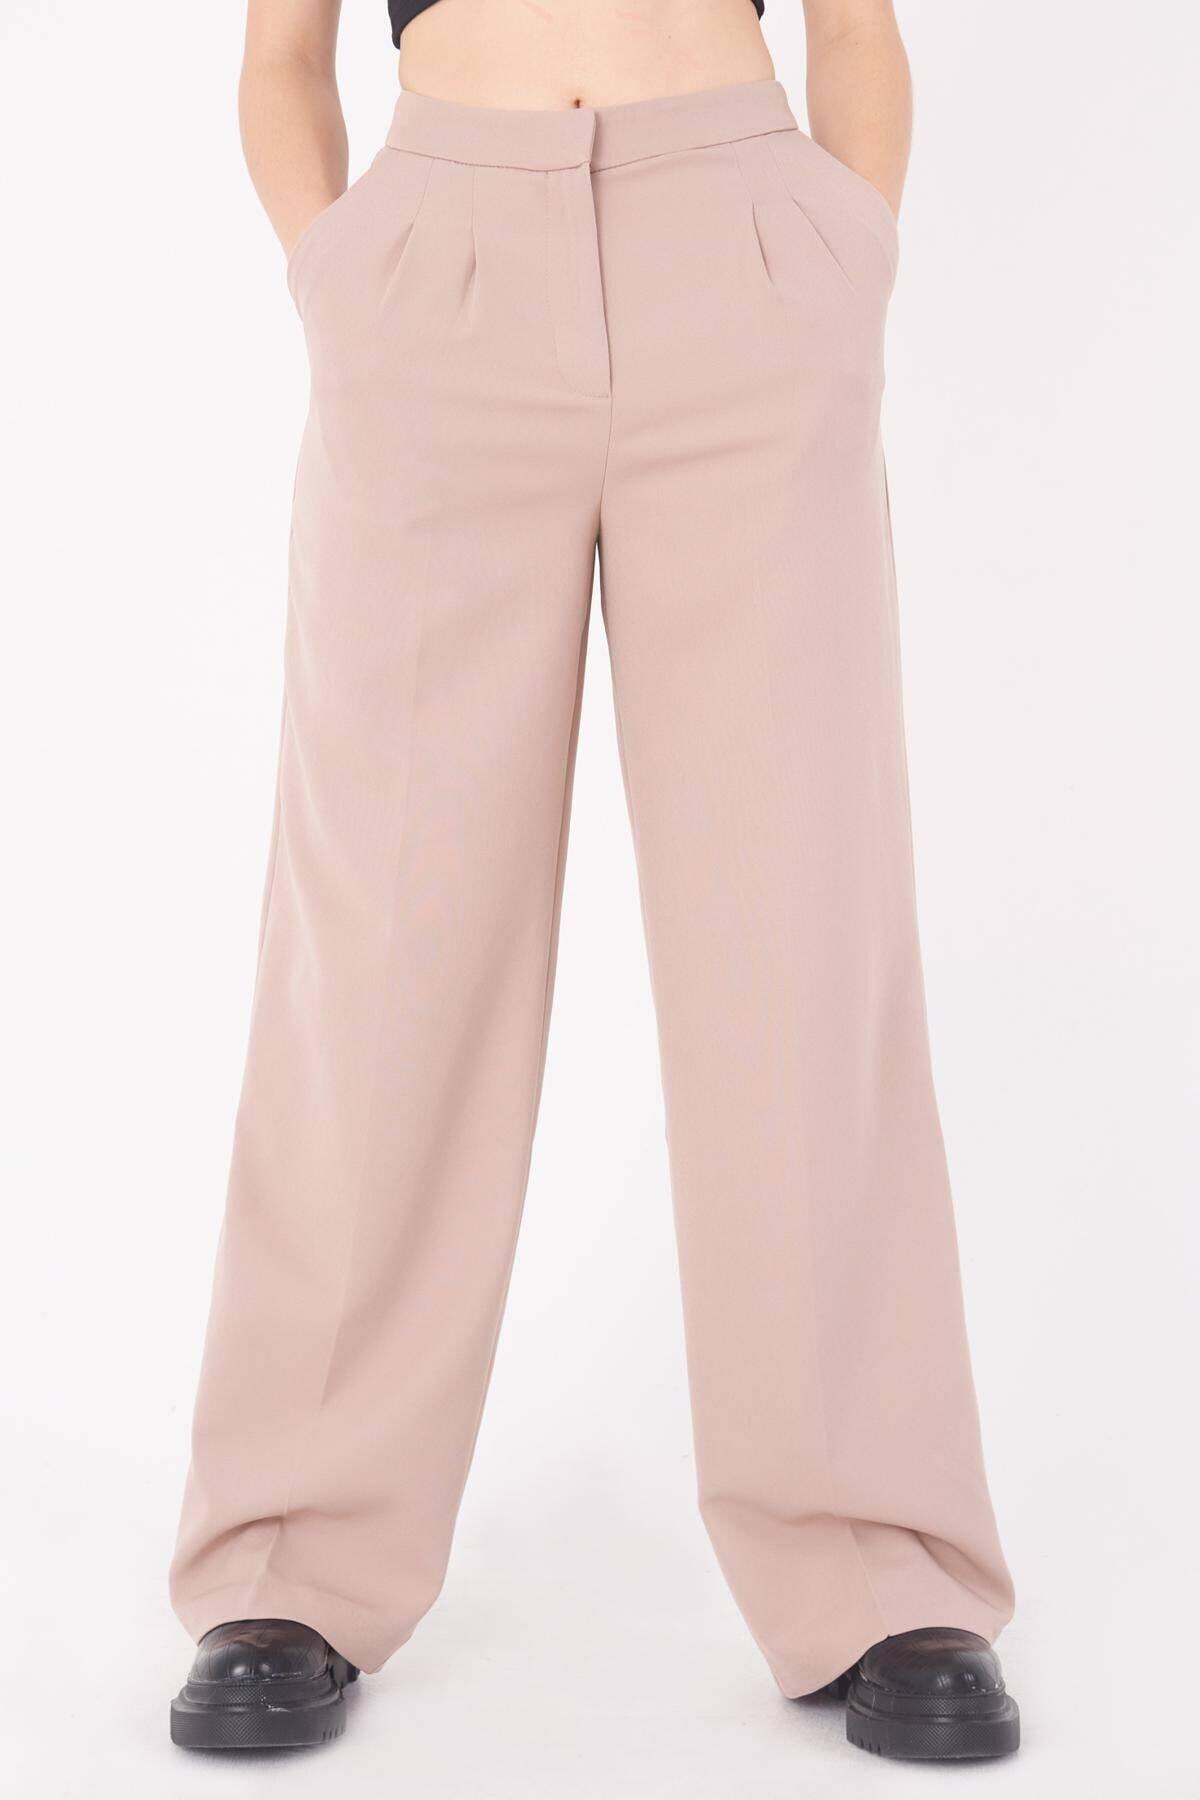 Addax Kadın Bej Cep Detaylı Bol Pantolon PN8058 - E8 ADX-0000023058 1